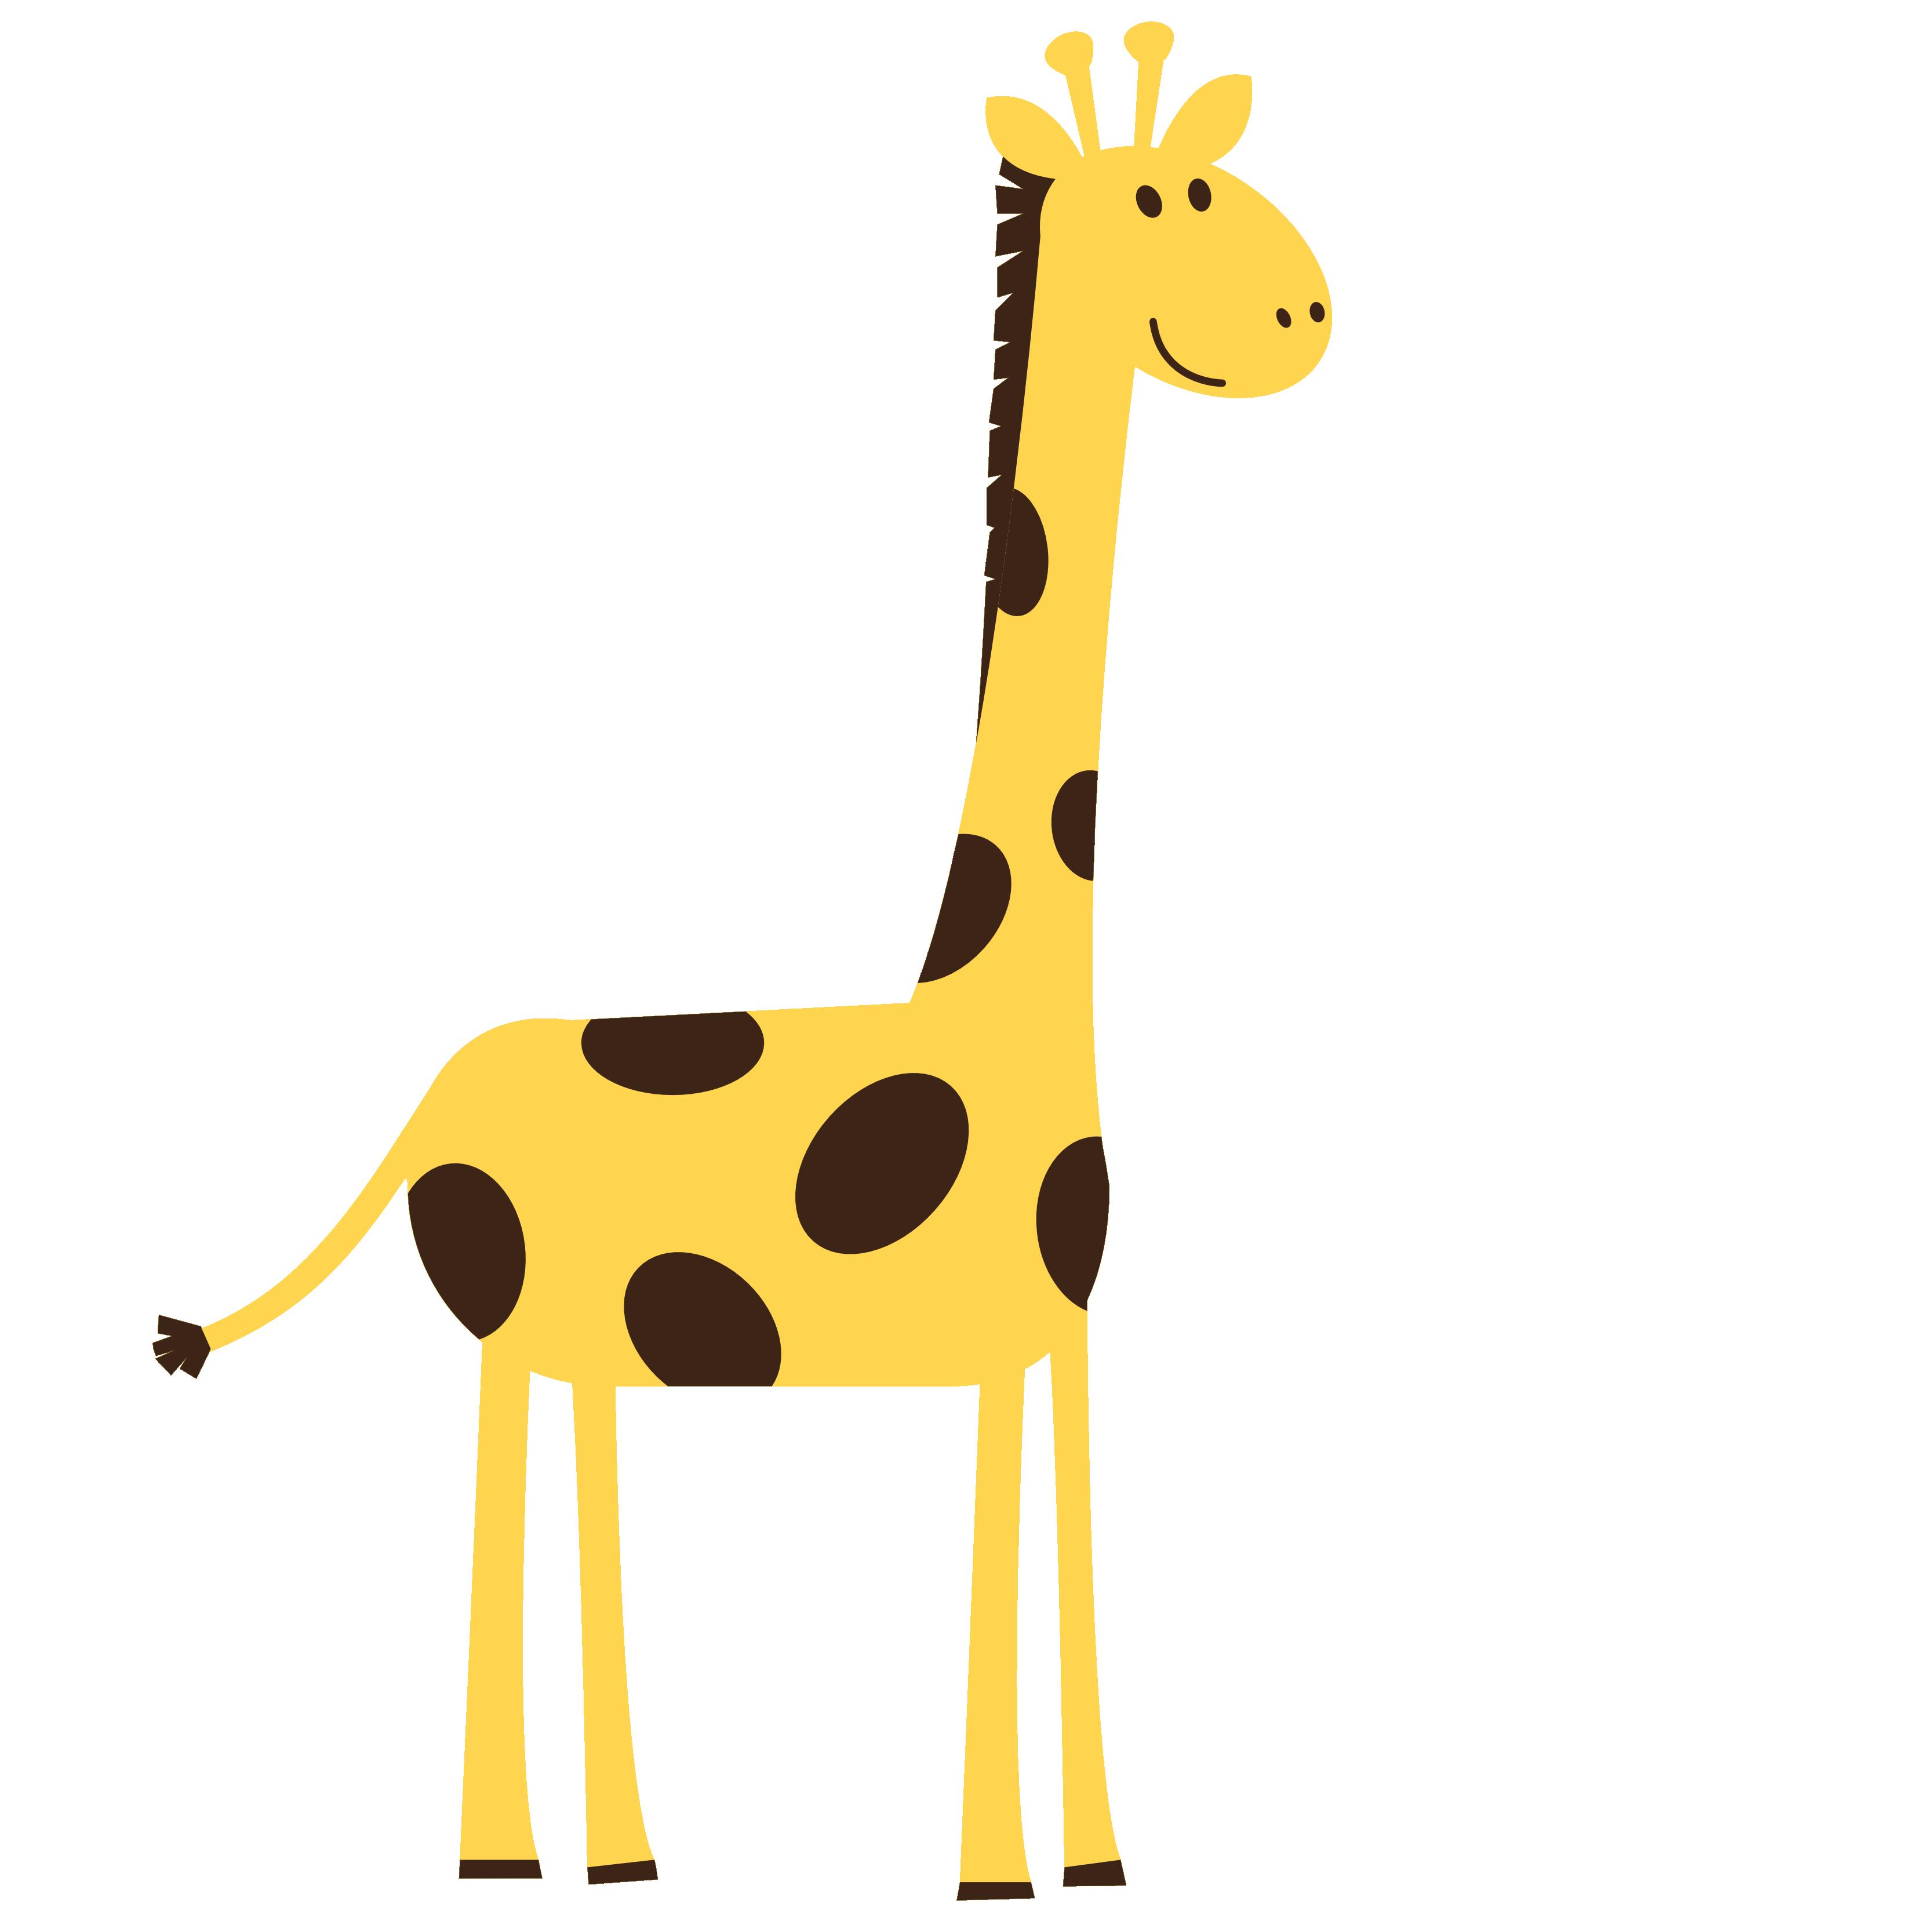 17 giraffe clipart kids birthday branding pinterest giraffe rh pinterest com  cartoon giraffe pictures clip art